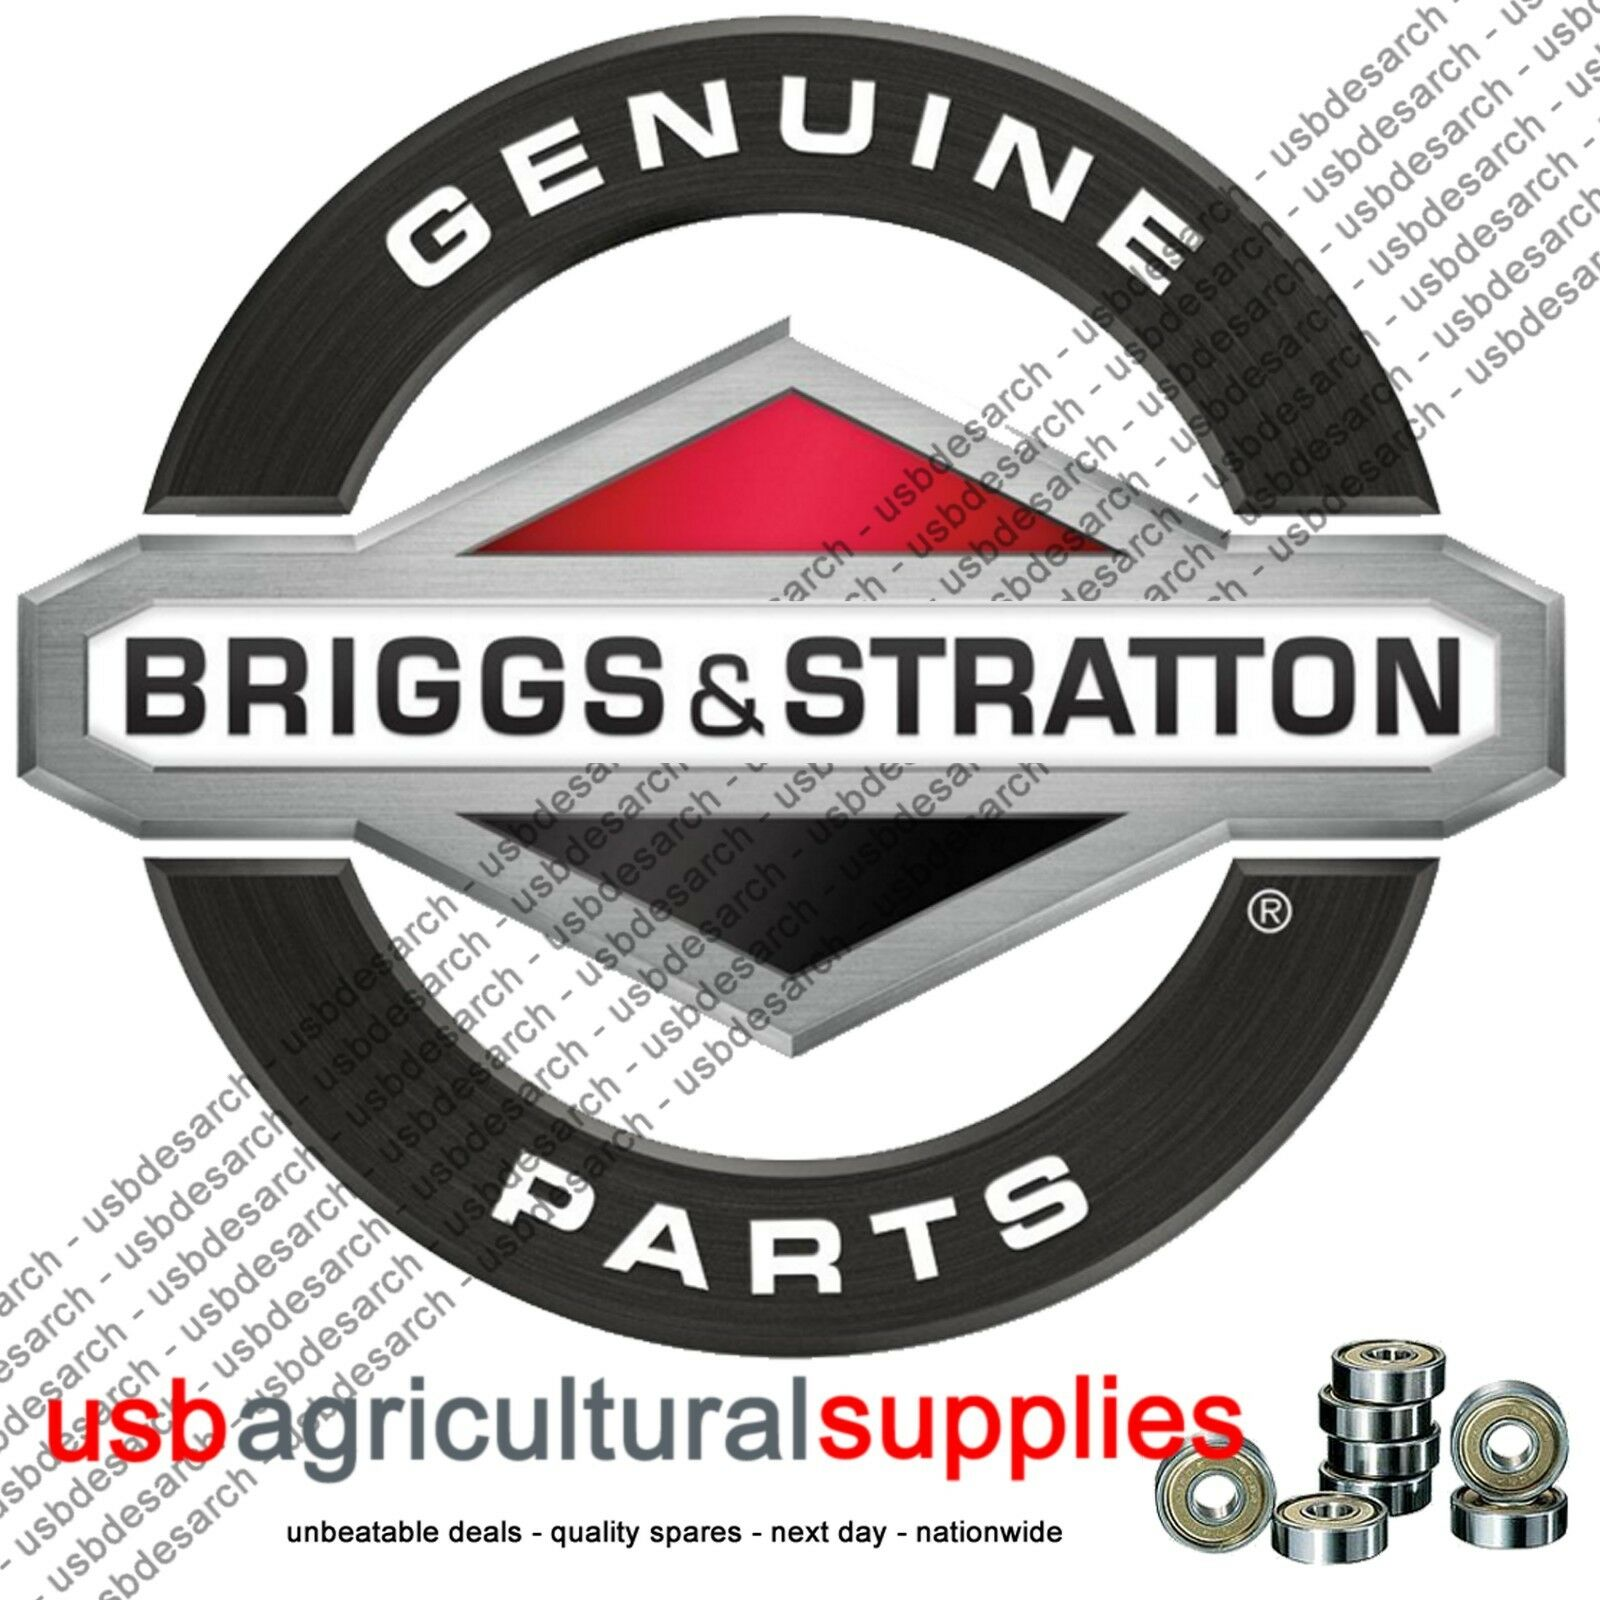 BRIGGS /& STRATTON GENIUNE VANGUARD SPARK PLUG TERMINAL BOOTS BS692076 692076